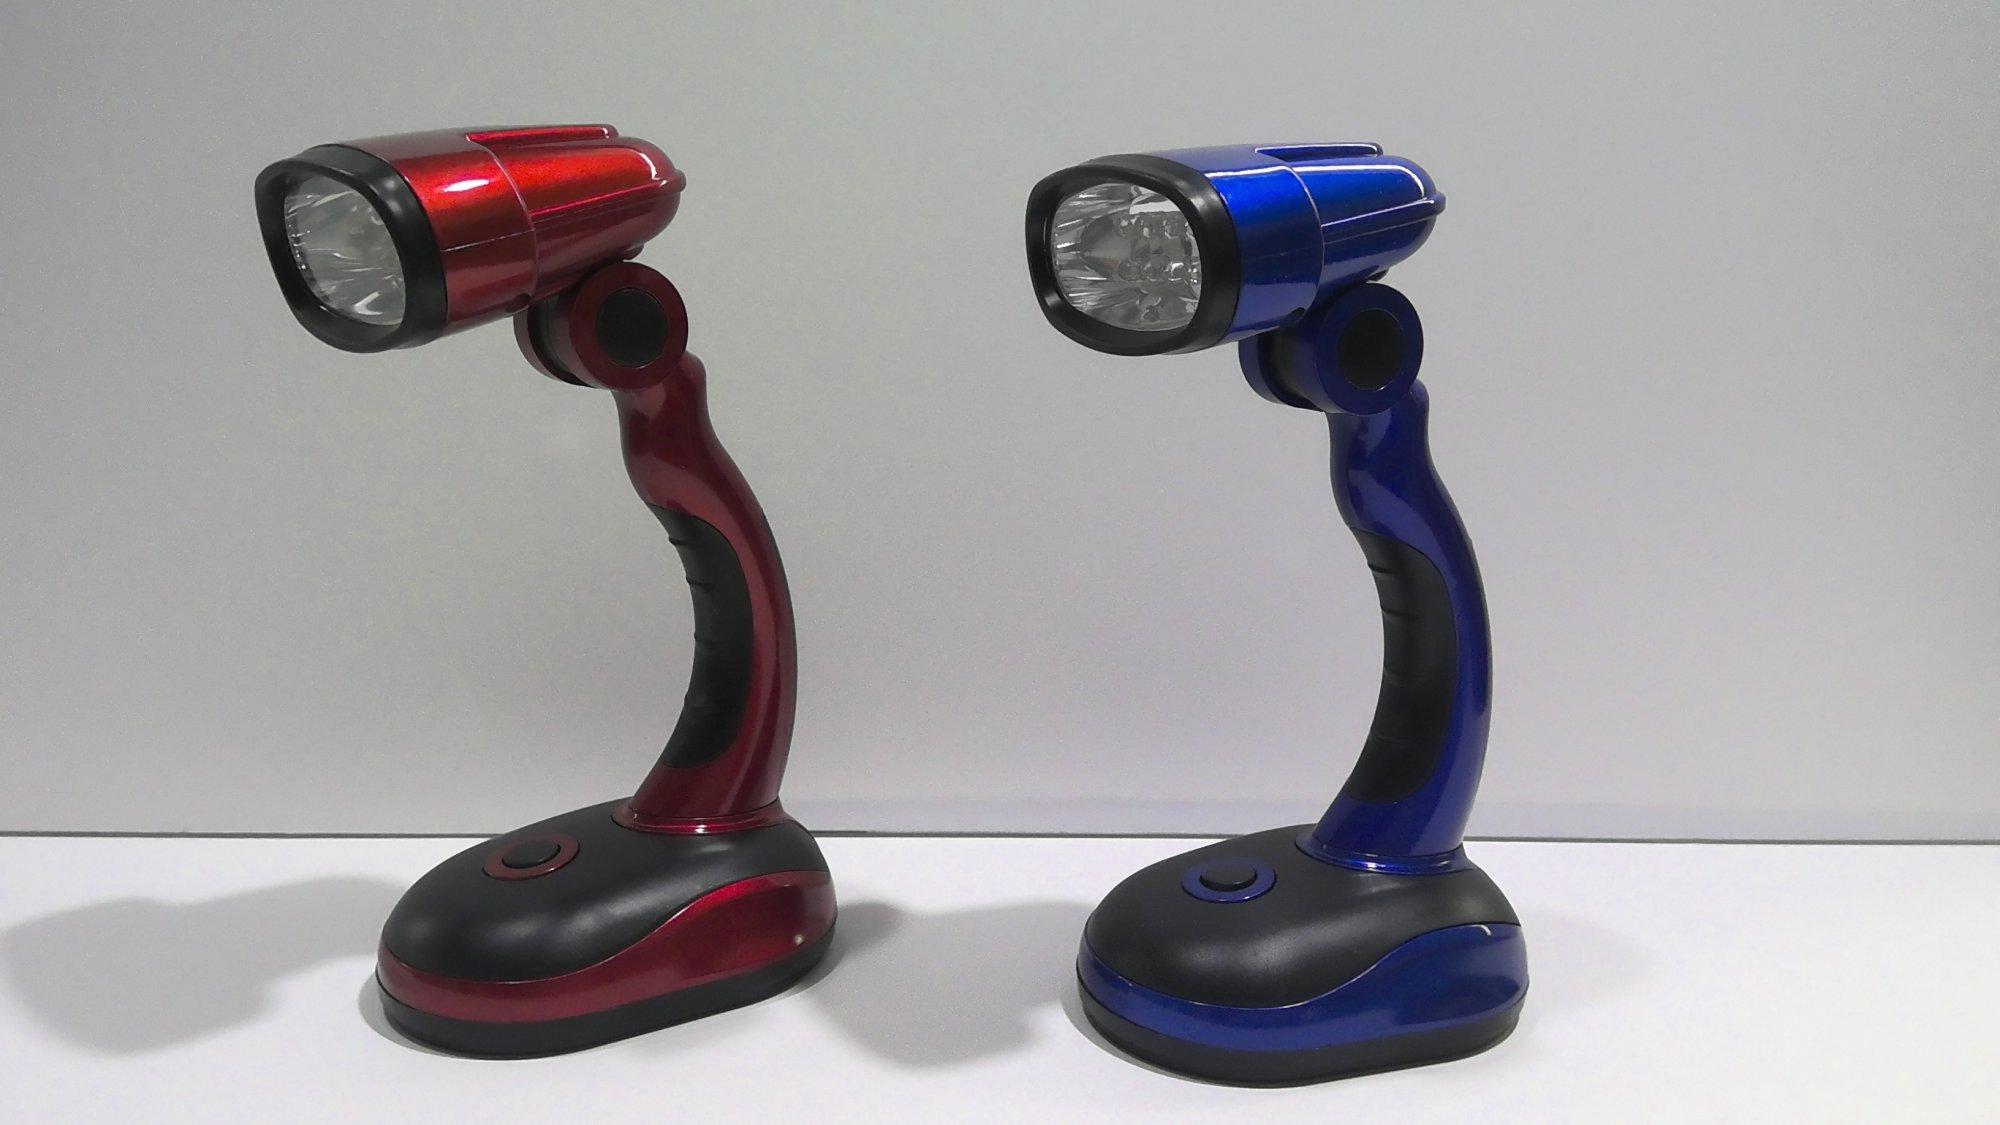 Portable LED Desk Lamp